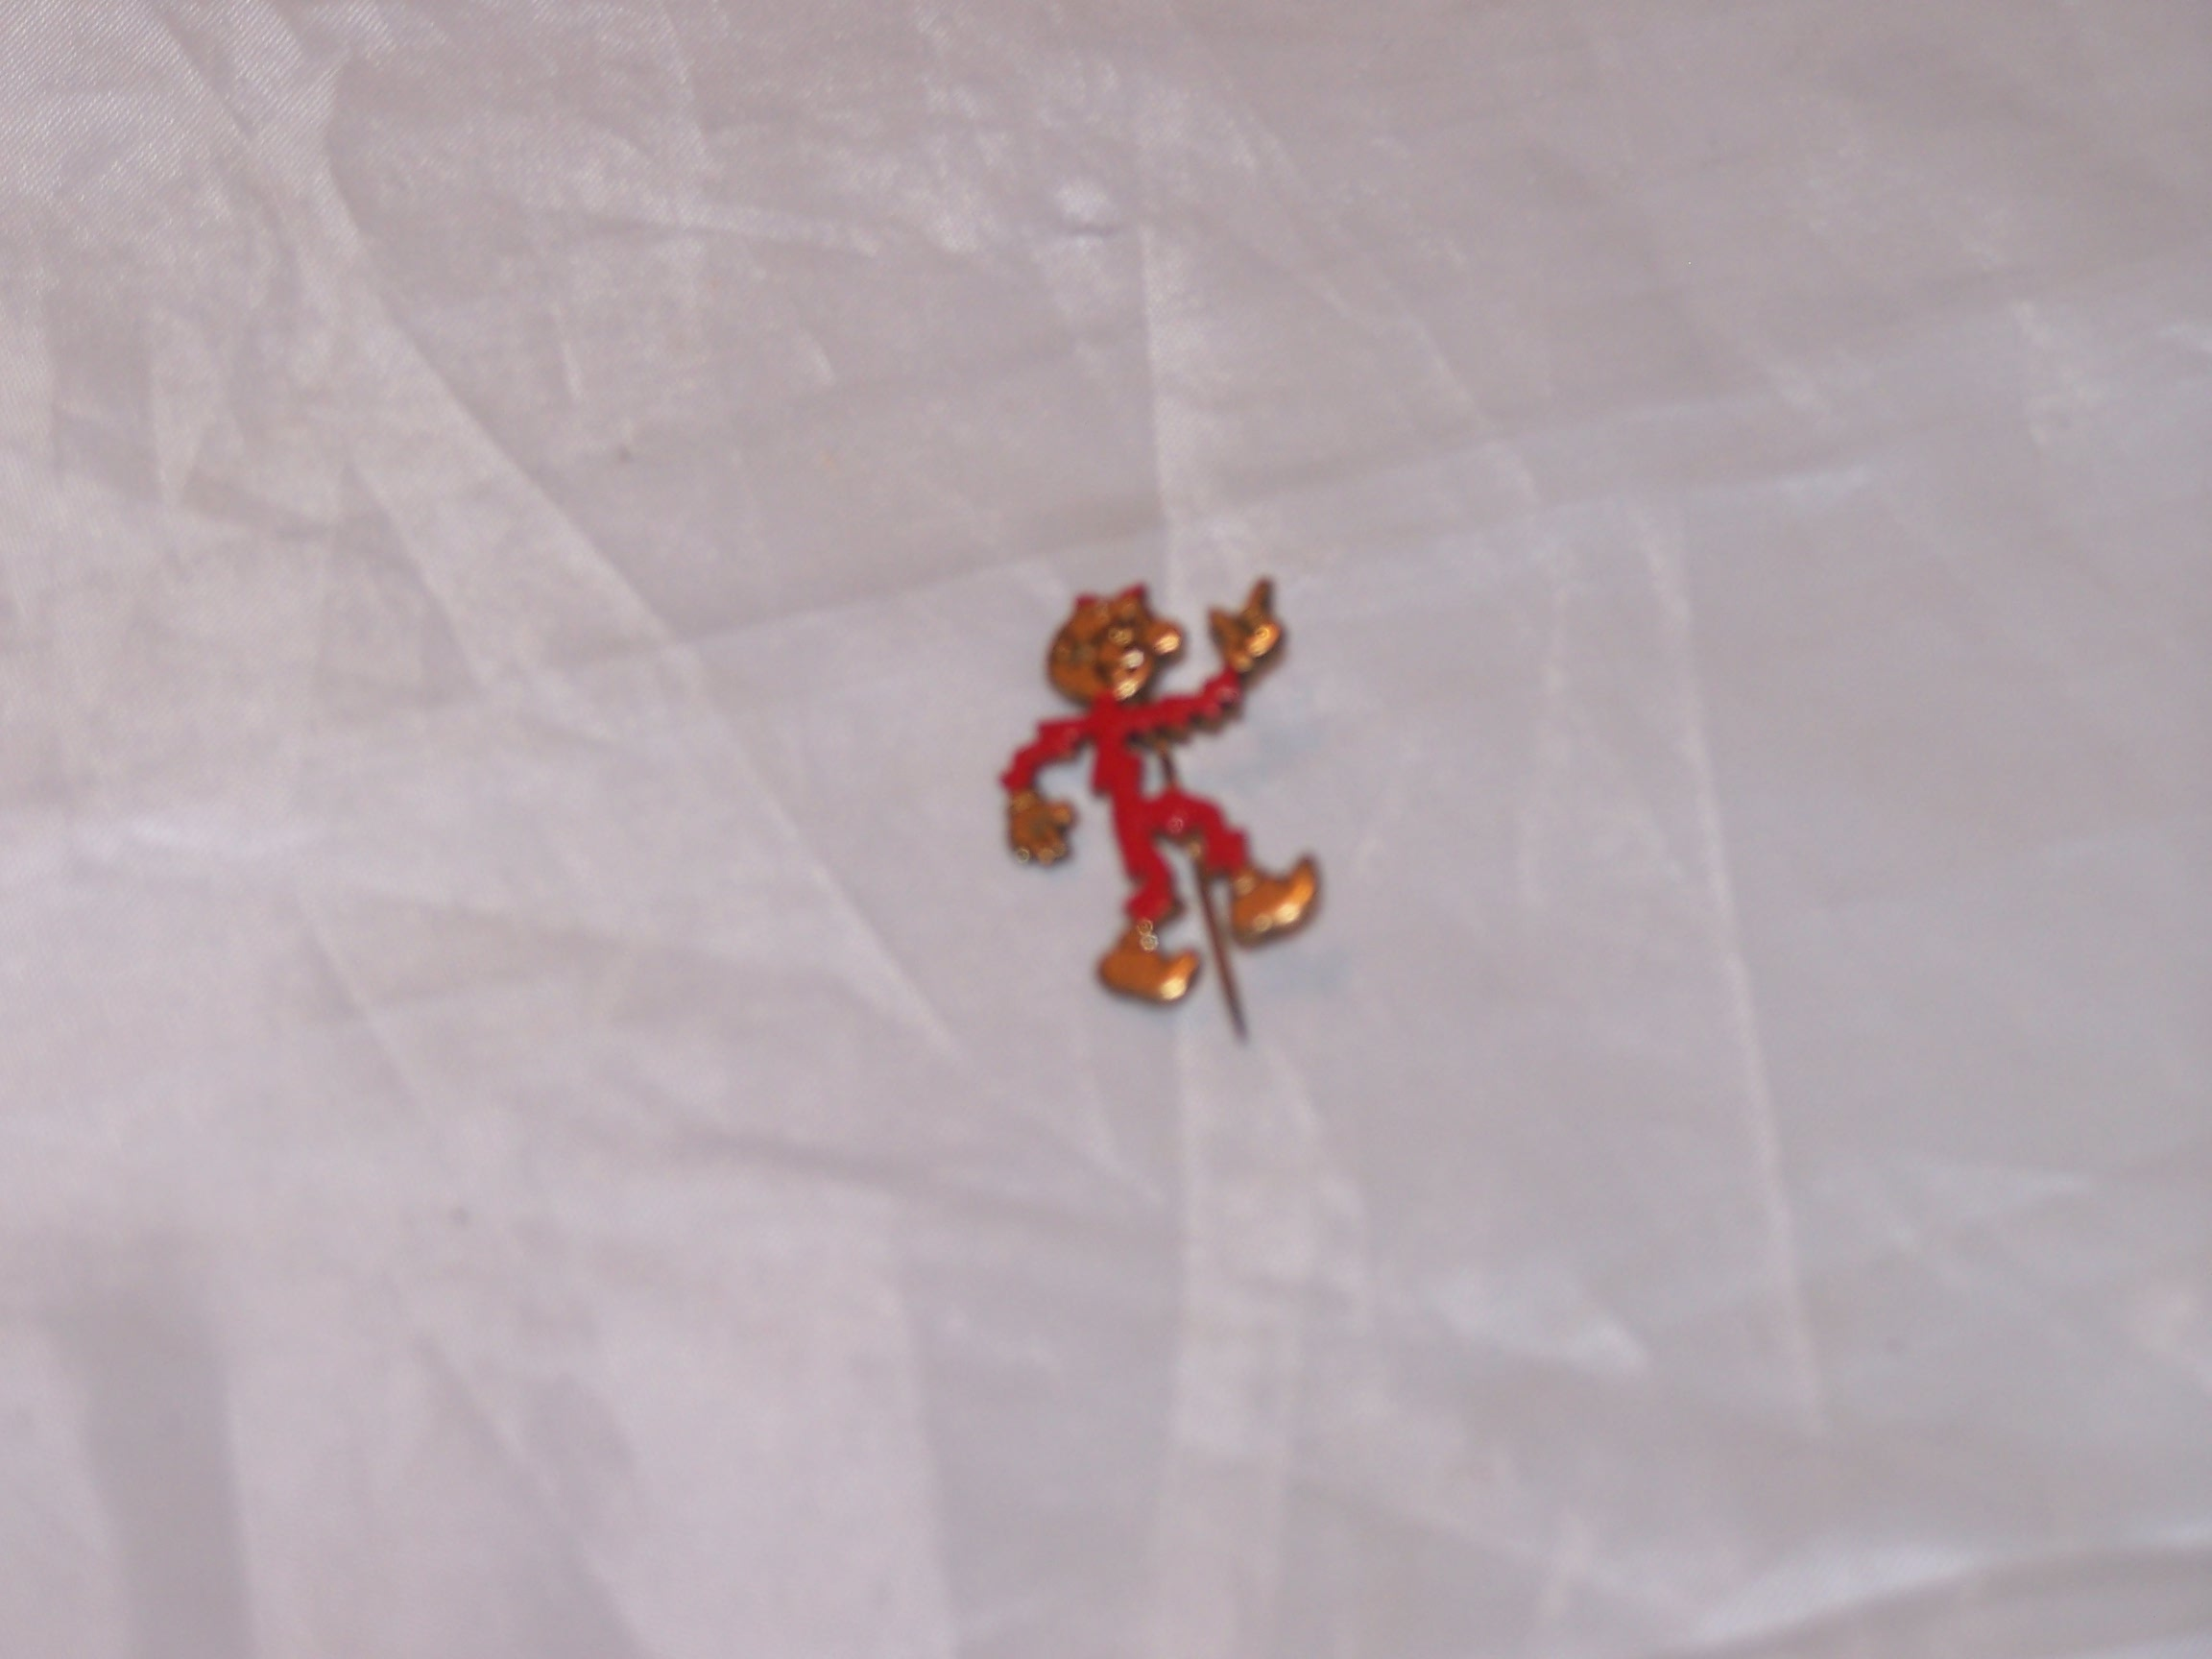 Image 1 of Reddy Kilowatt, The Mighty Atom, Pin